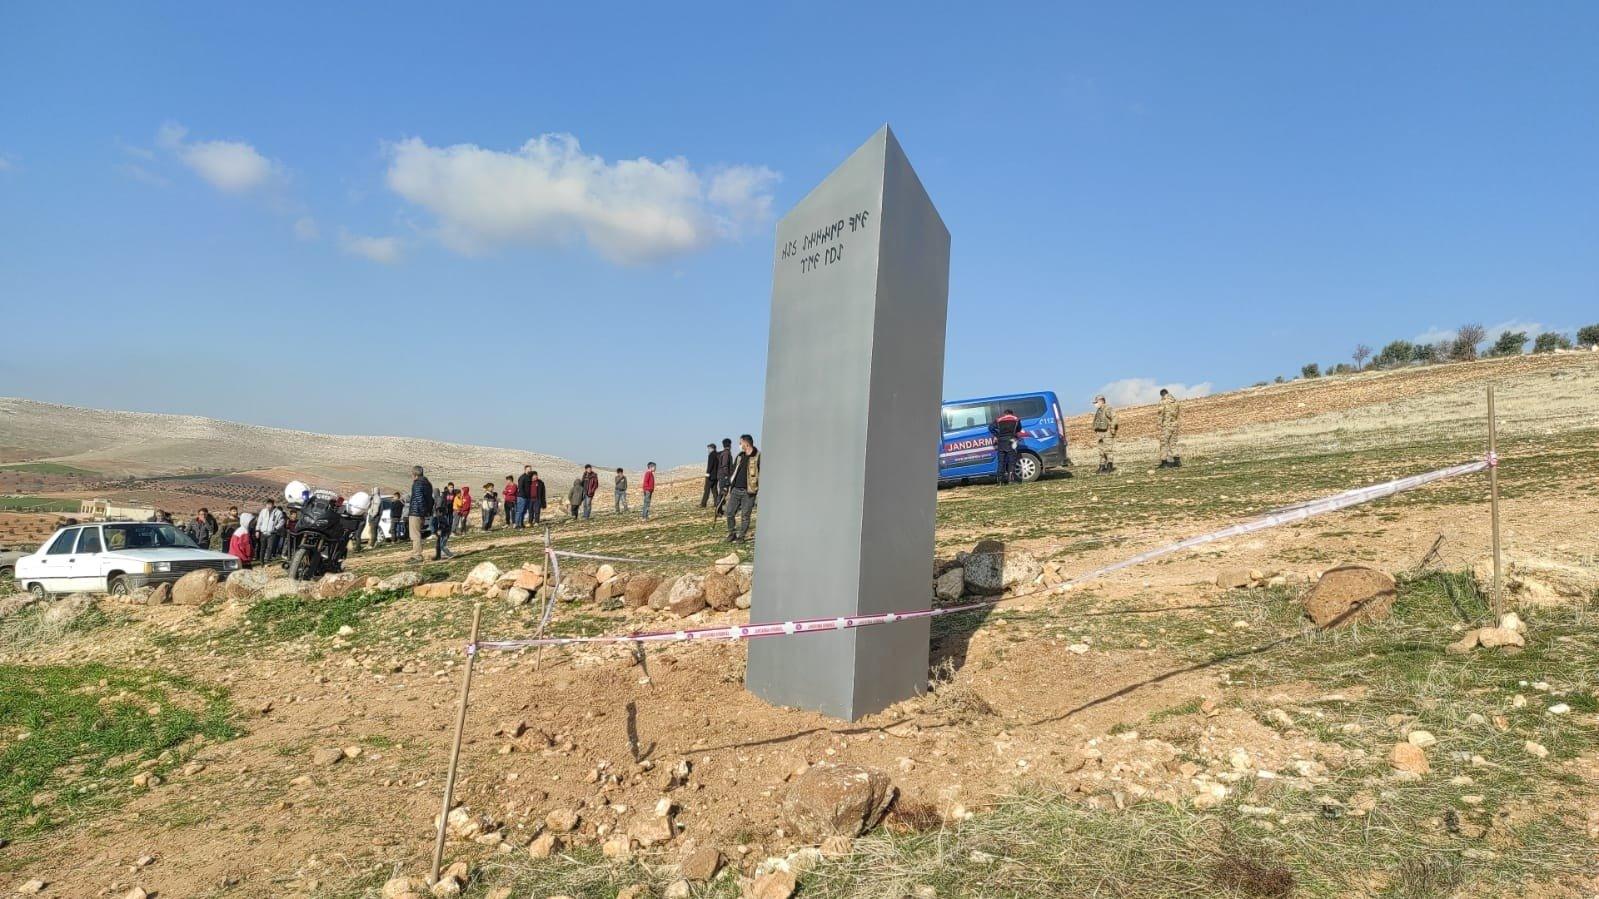 A view of the metal slab cordoned off by security forces, in Şanlıurfa, southeastern Turkey, Feb. 5, 2021. (IHA Photo)